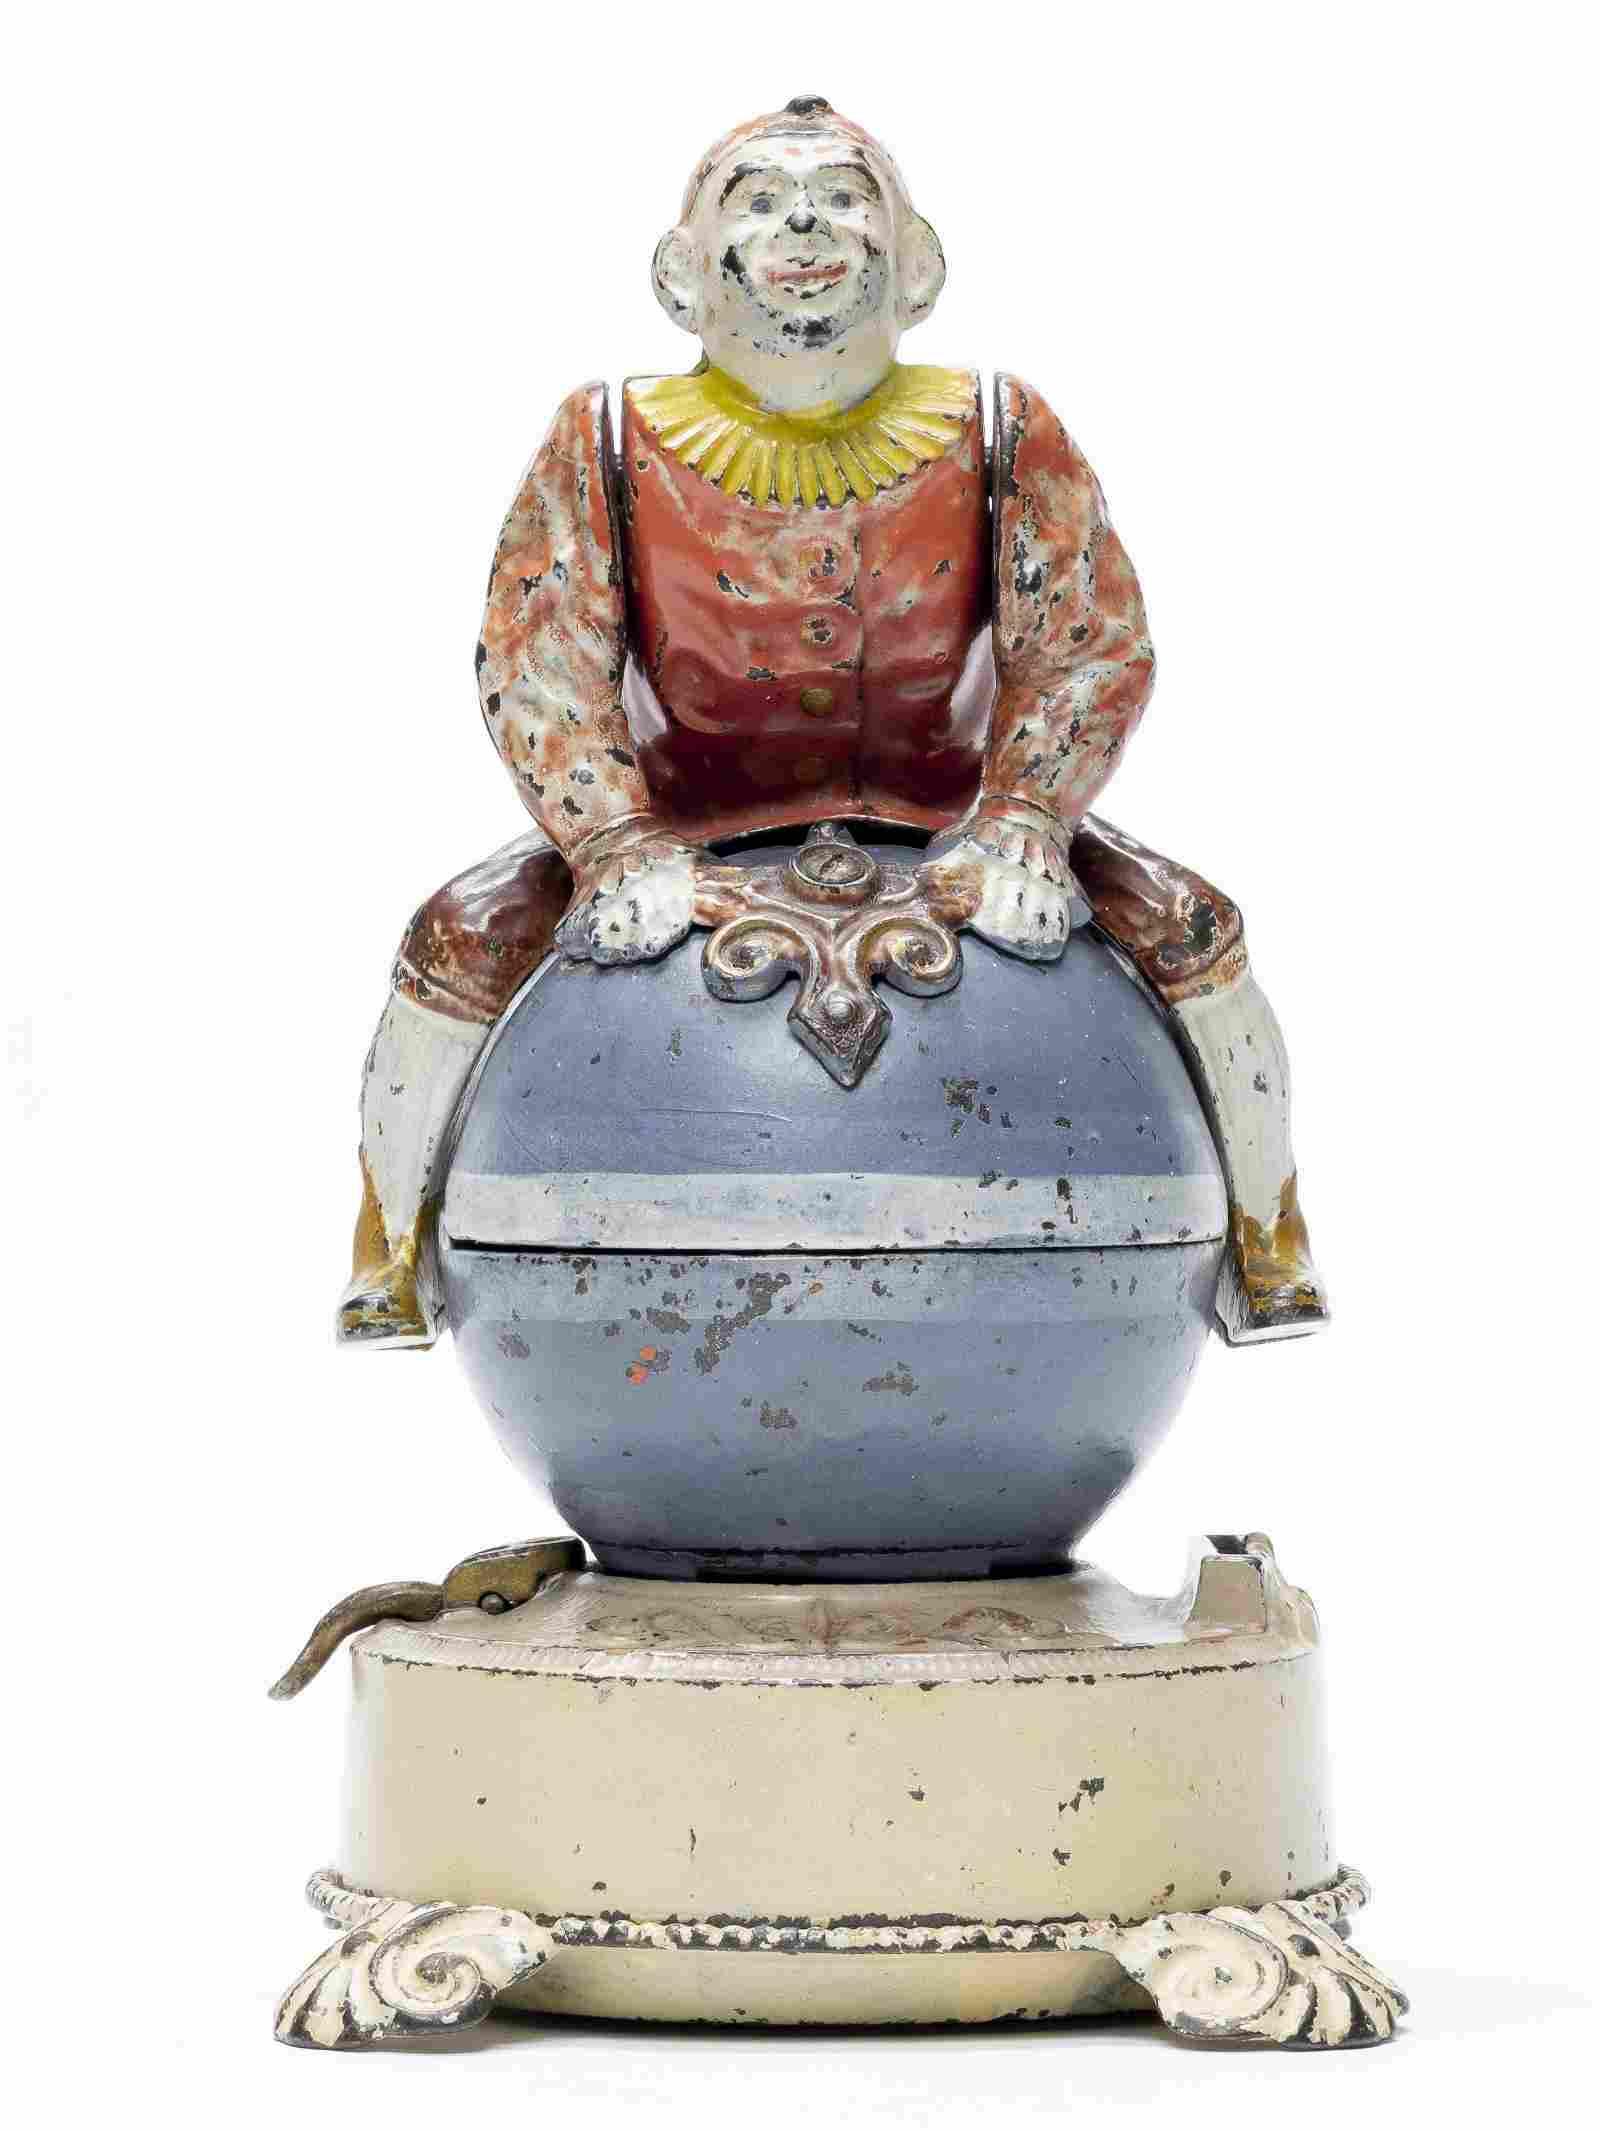 Clown on Globe Cast Iron Mechanical Bank